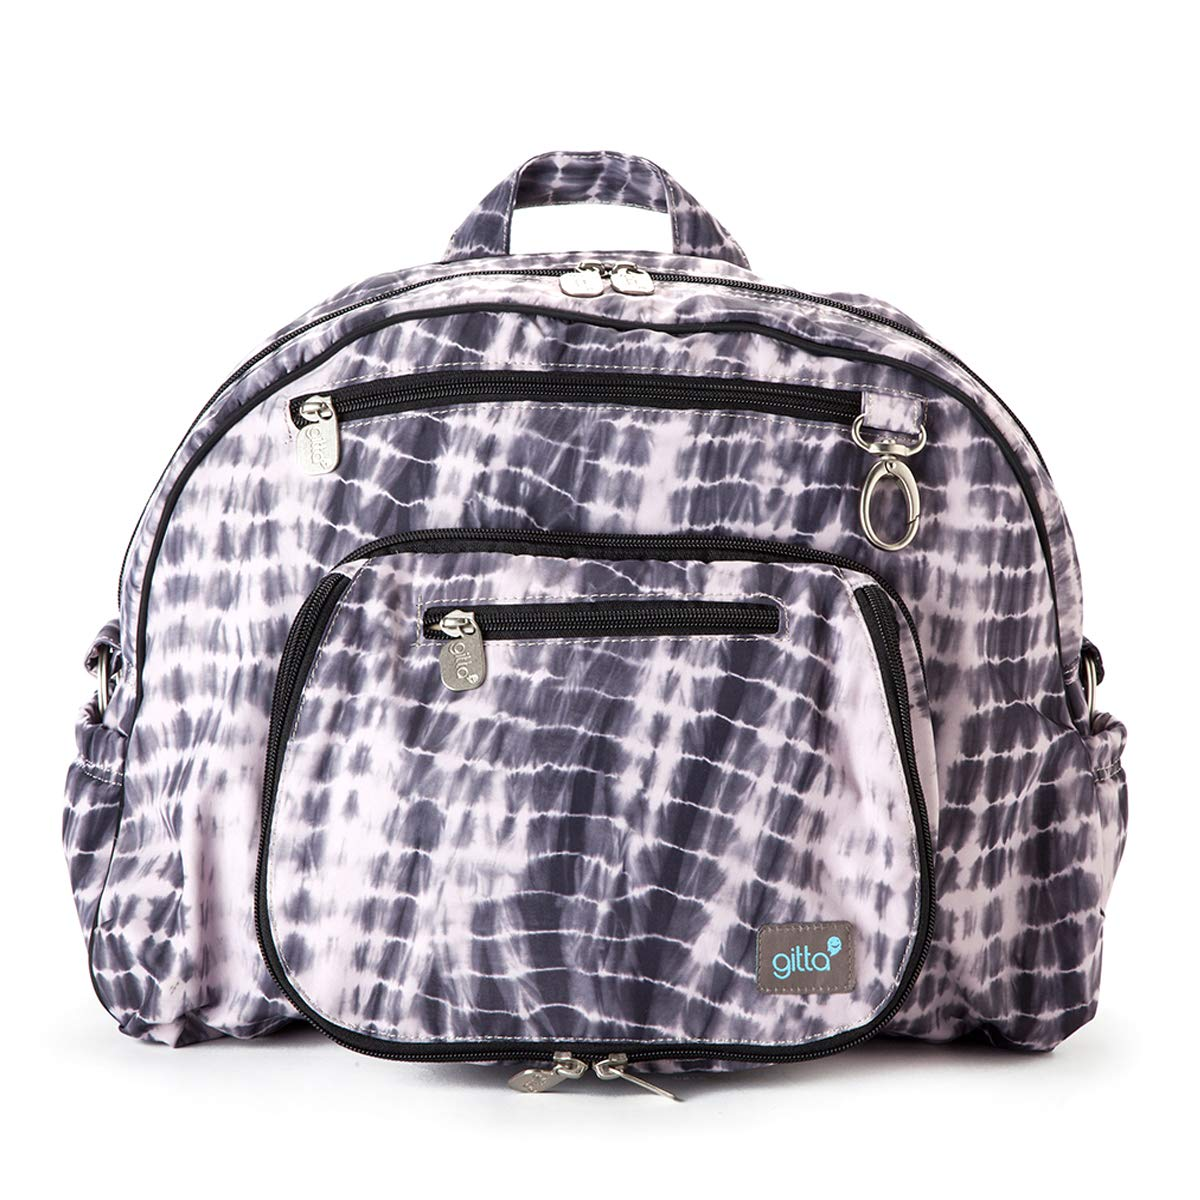 Gitta Jumbo Multi Function Baby Nappy Changing Diaper Backpack, Tie Dye